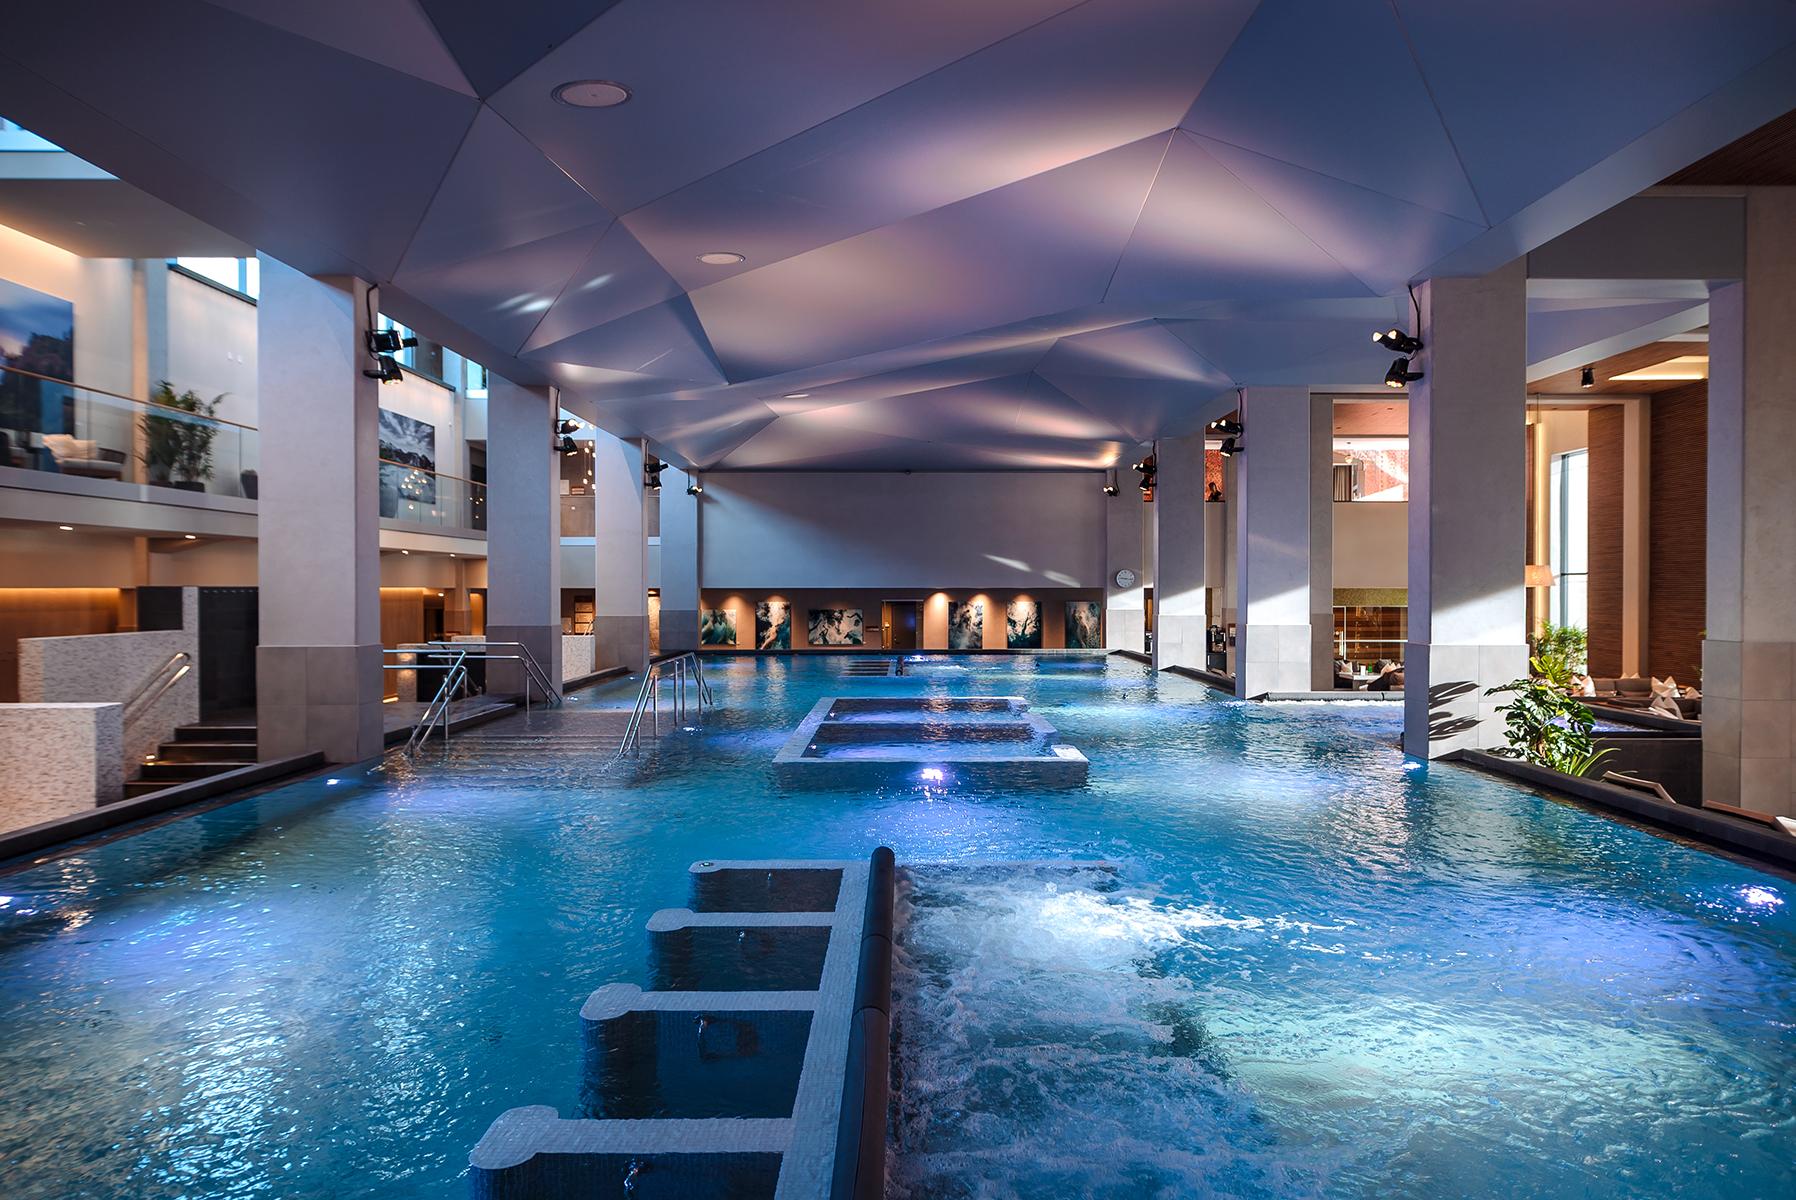 The Well Wellness Pool